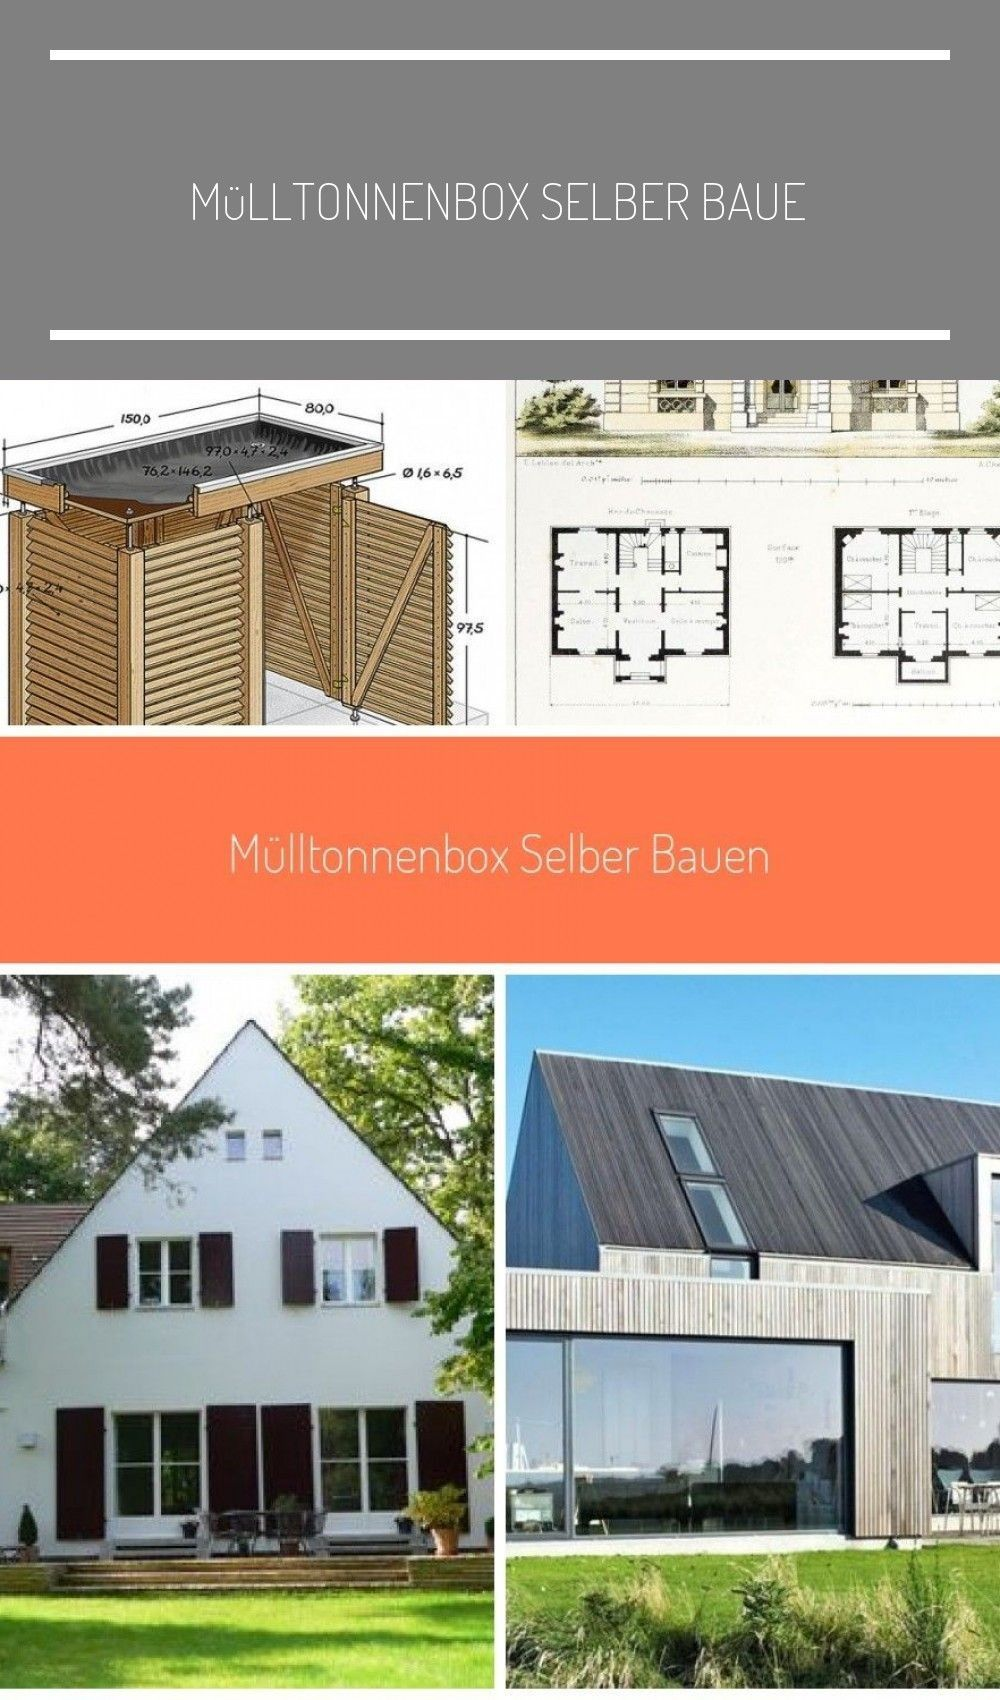 Mülltonnenbox selber baue - #baue #Mülltonnenbox #selber # ...